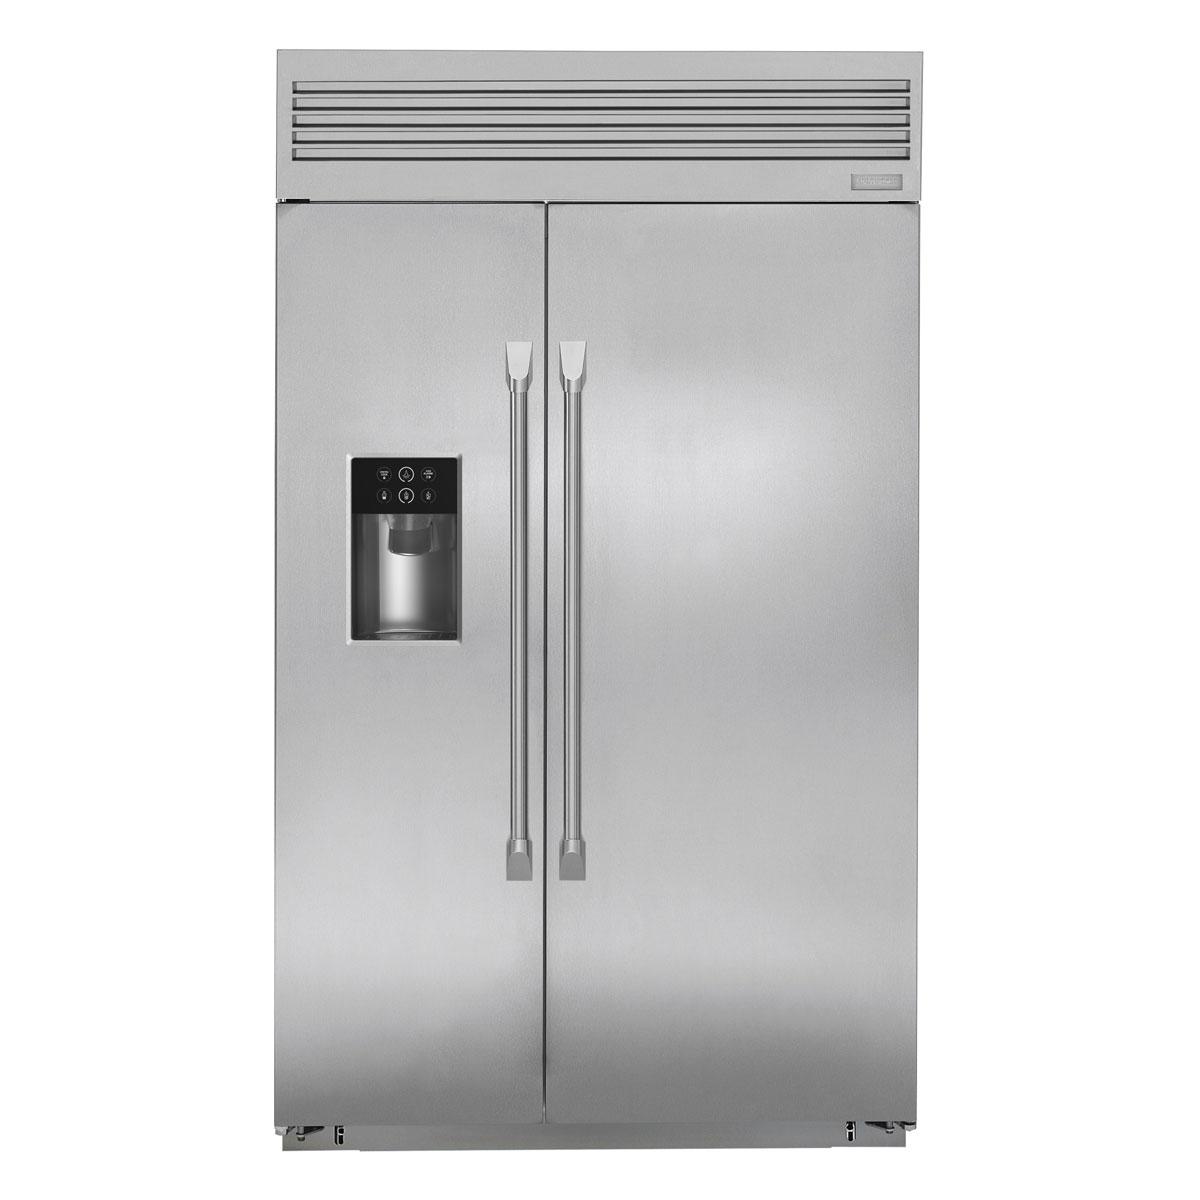 冰箱ZCSP480DMSS